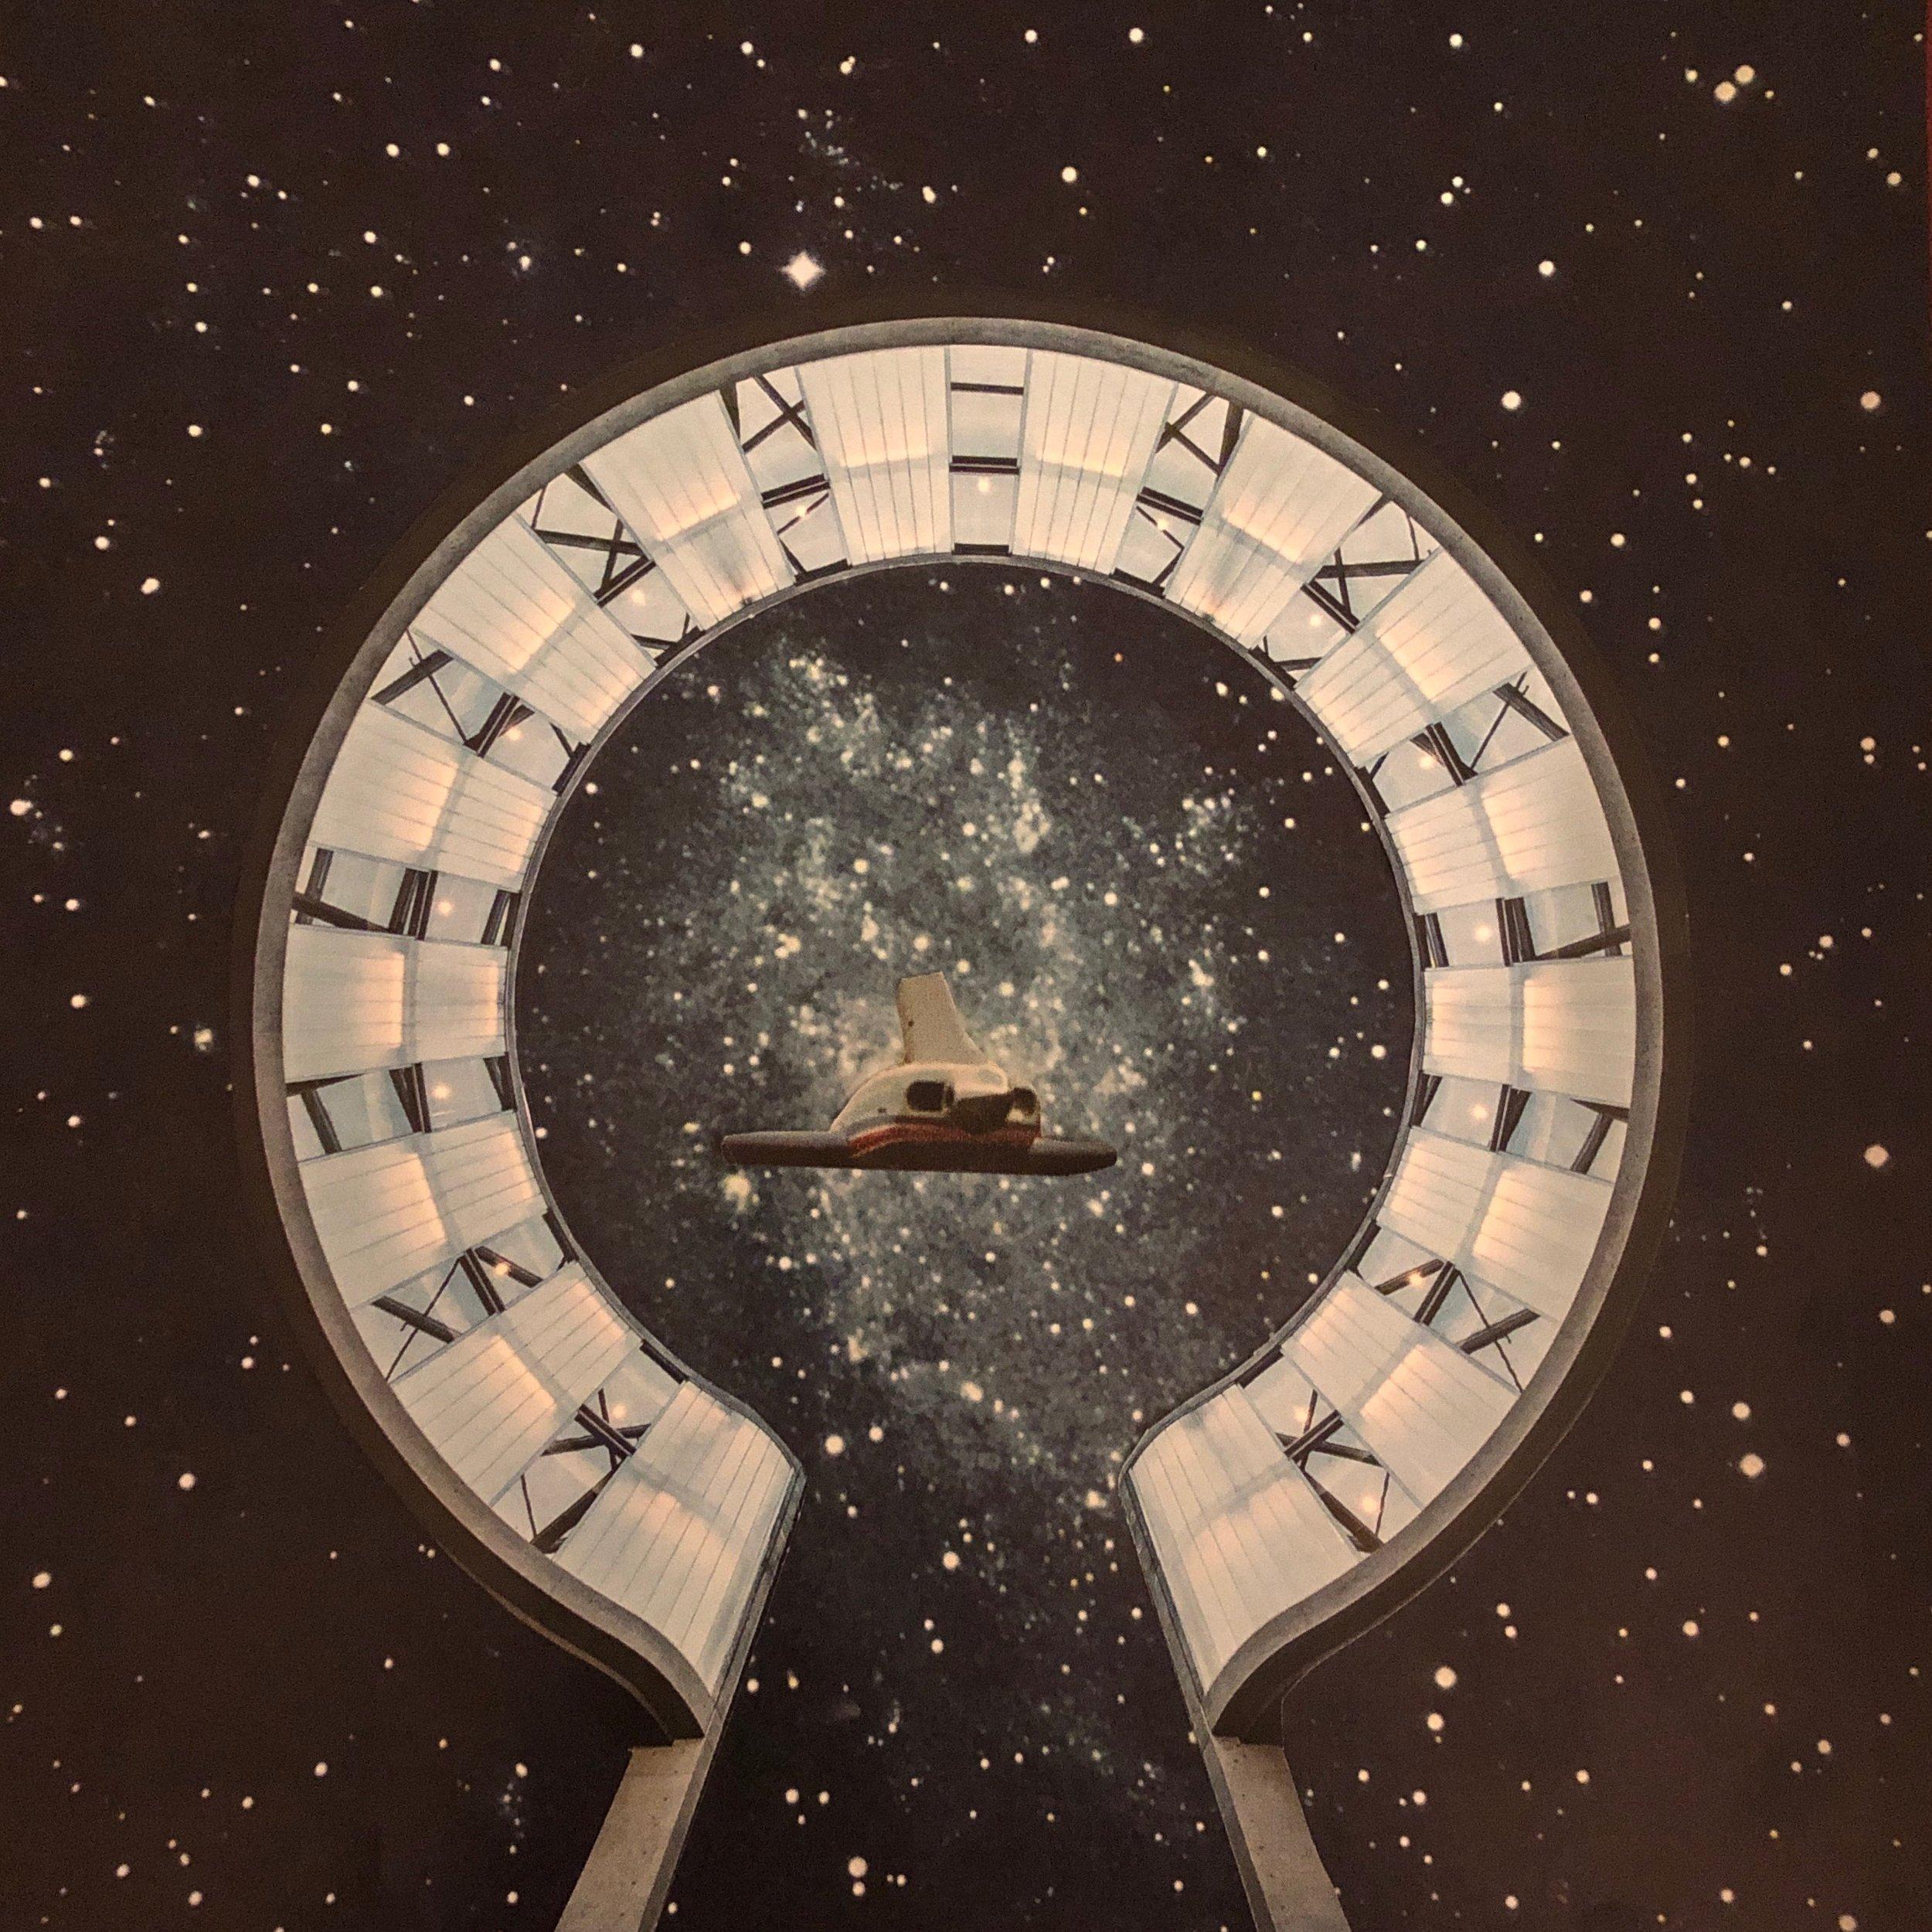 Cosmic Portal Gate - Analog Collage - 2019